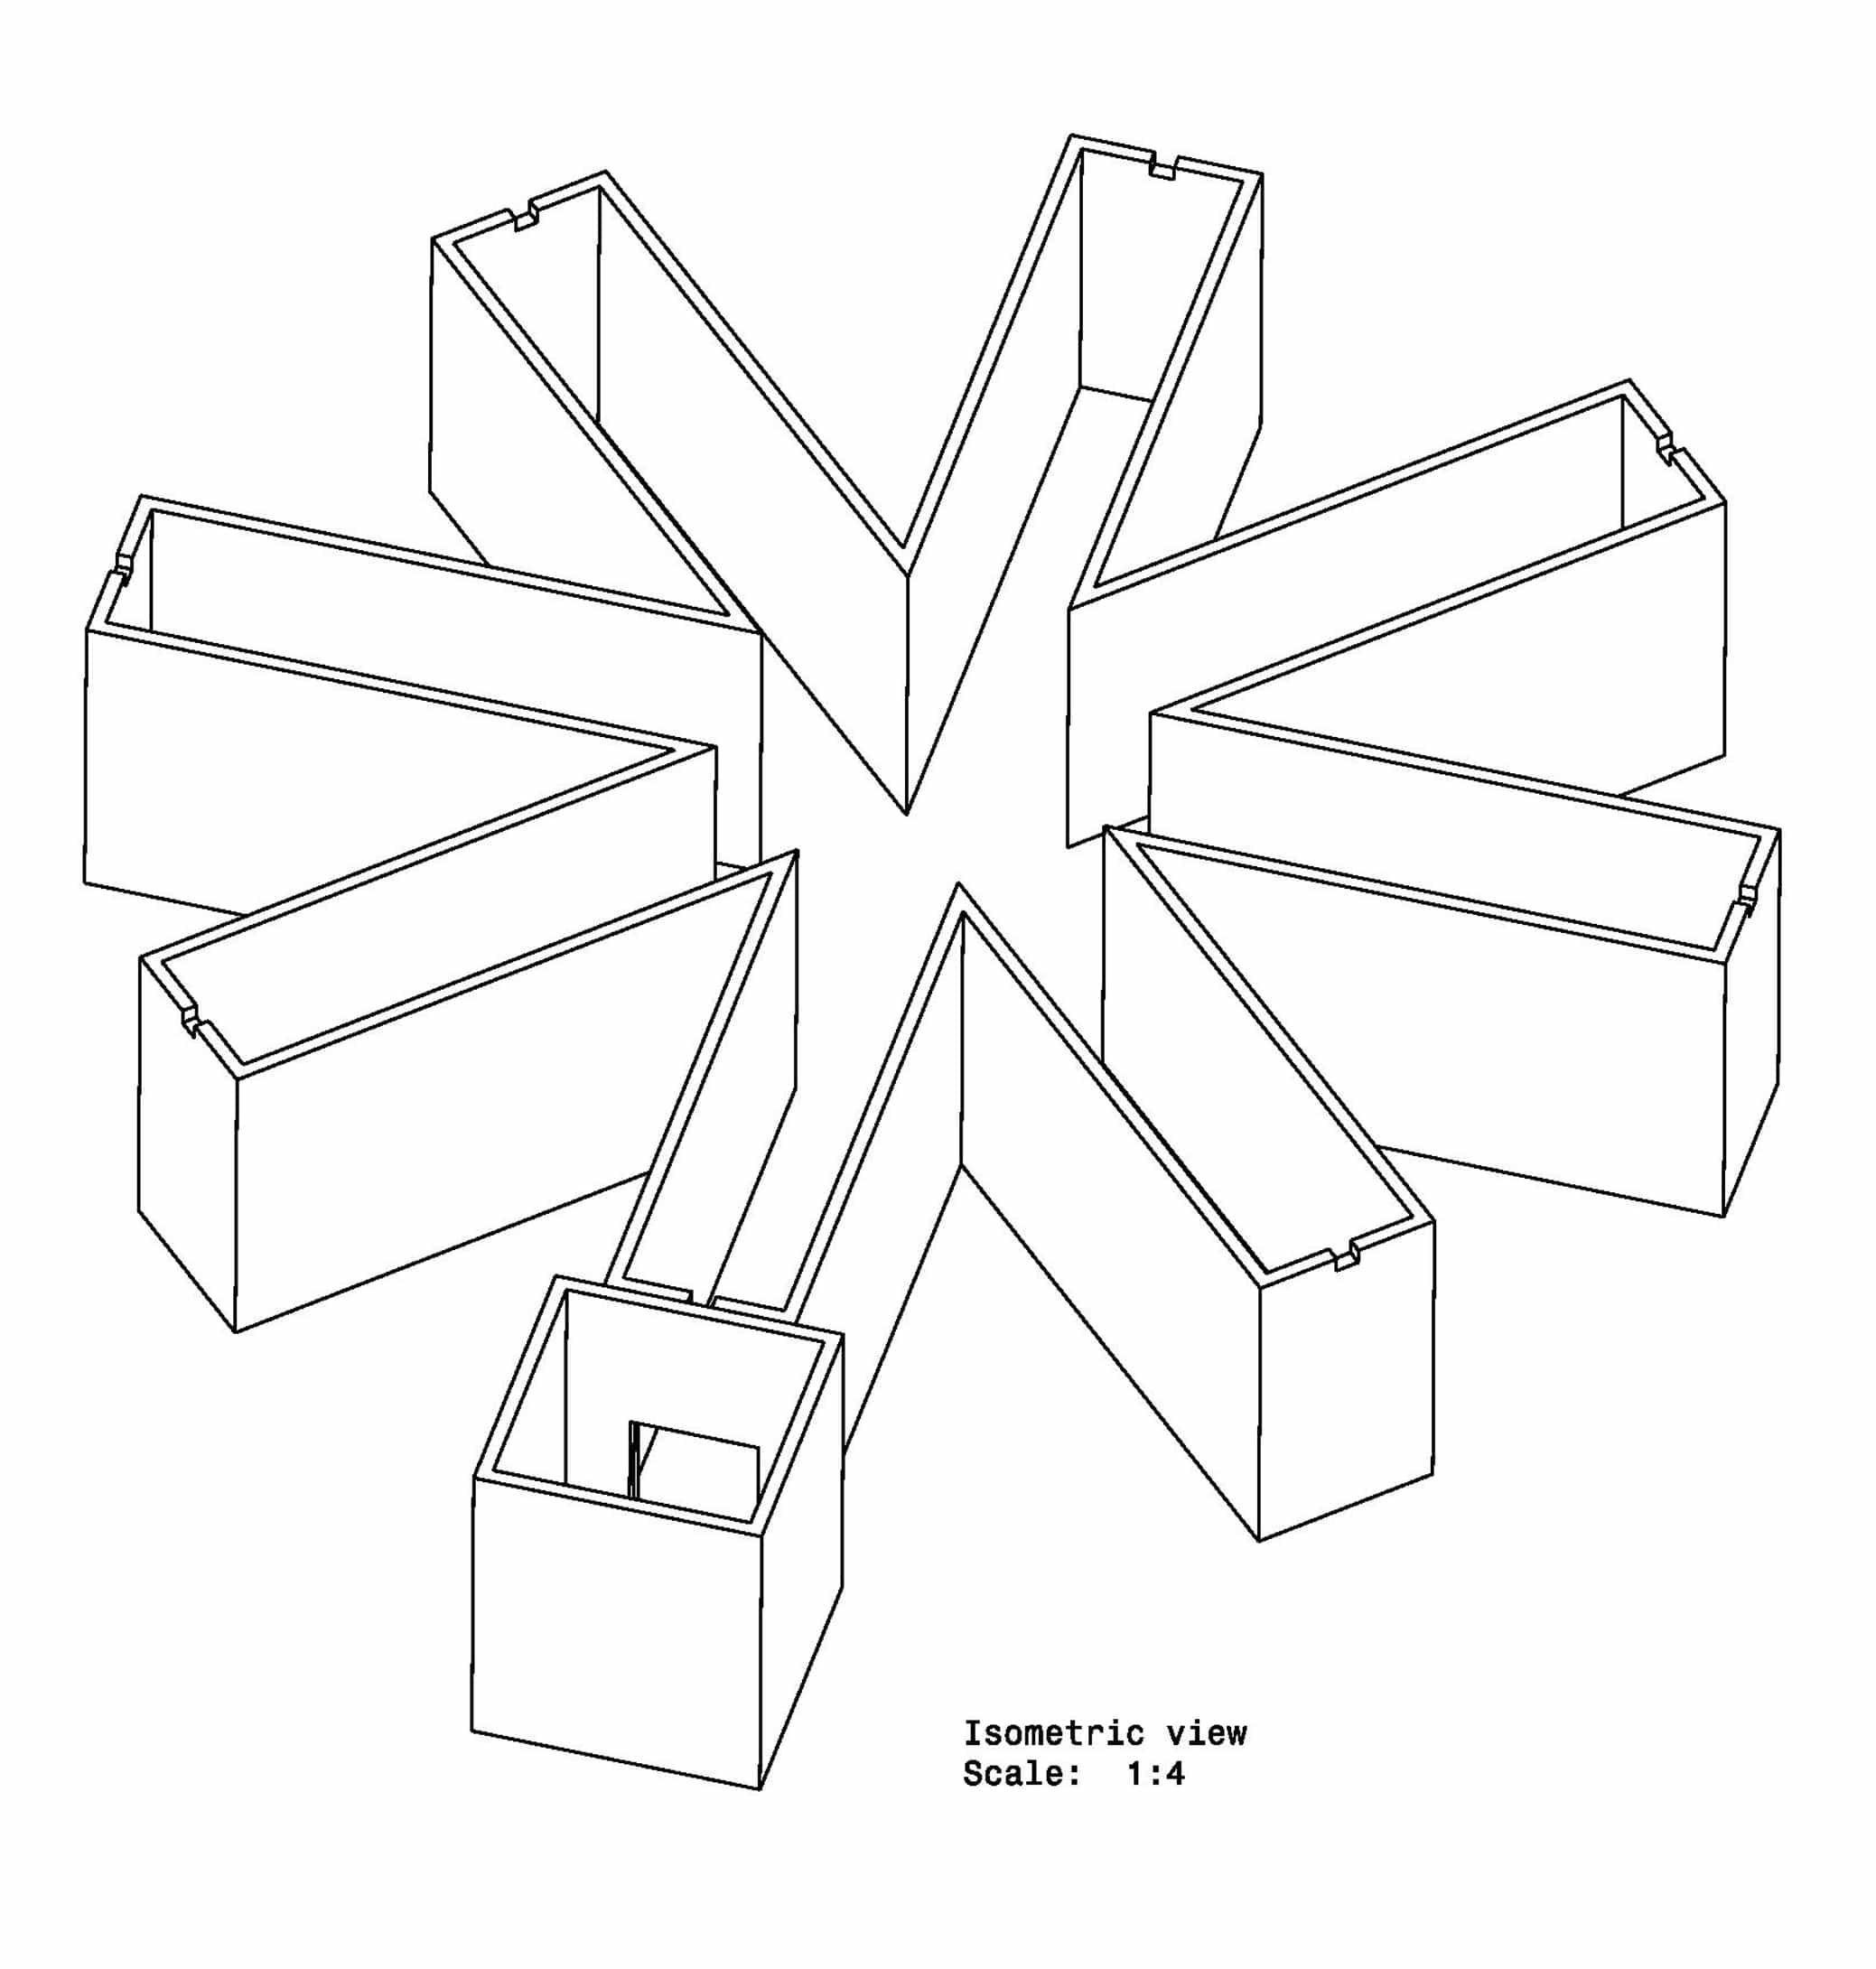 Radial Arm Maze - Rat Goal Box - Image 1